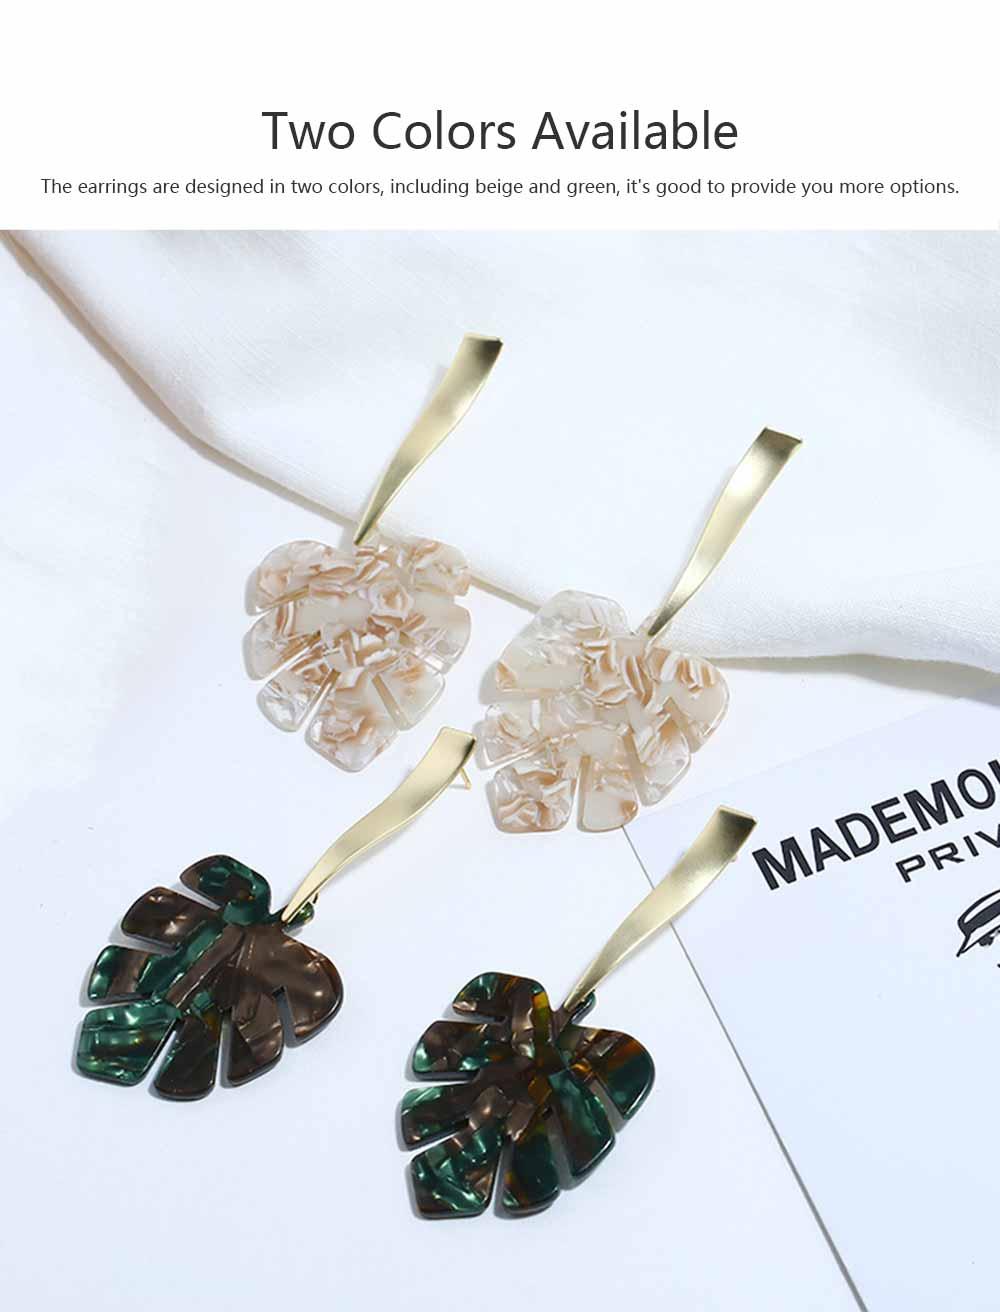 Ear-bob Zinc Alloy Material Ear Pendant Electroplating Process Maple Leaf Earring Decoration  Fashionable Earrings 3